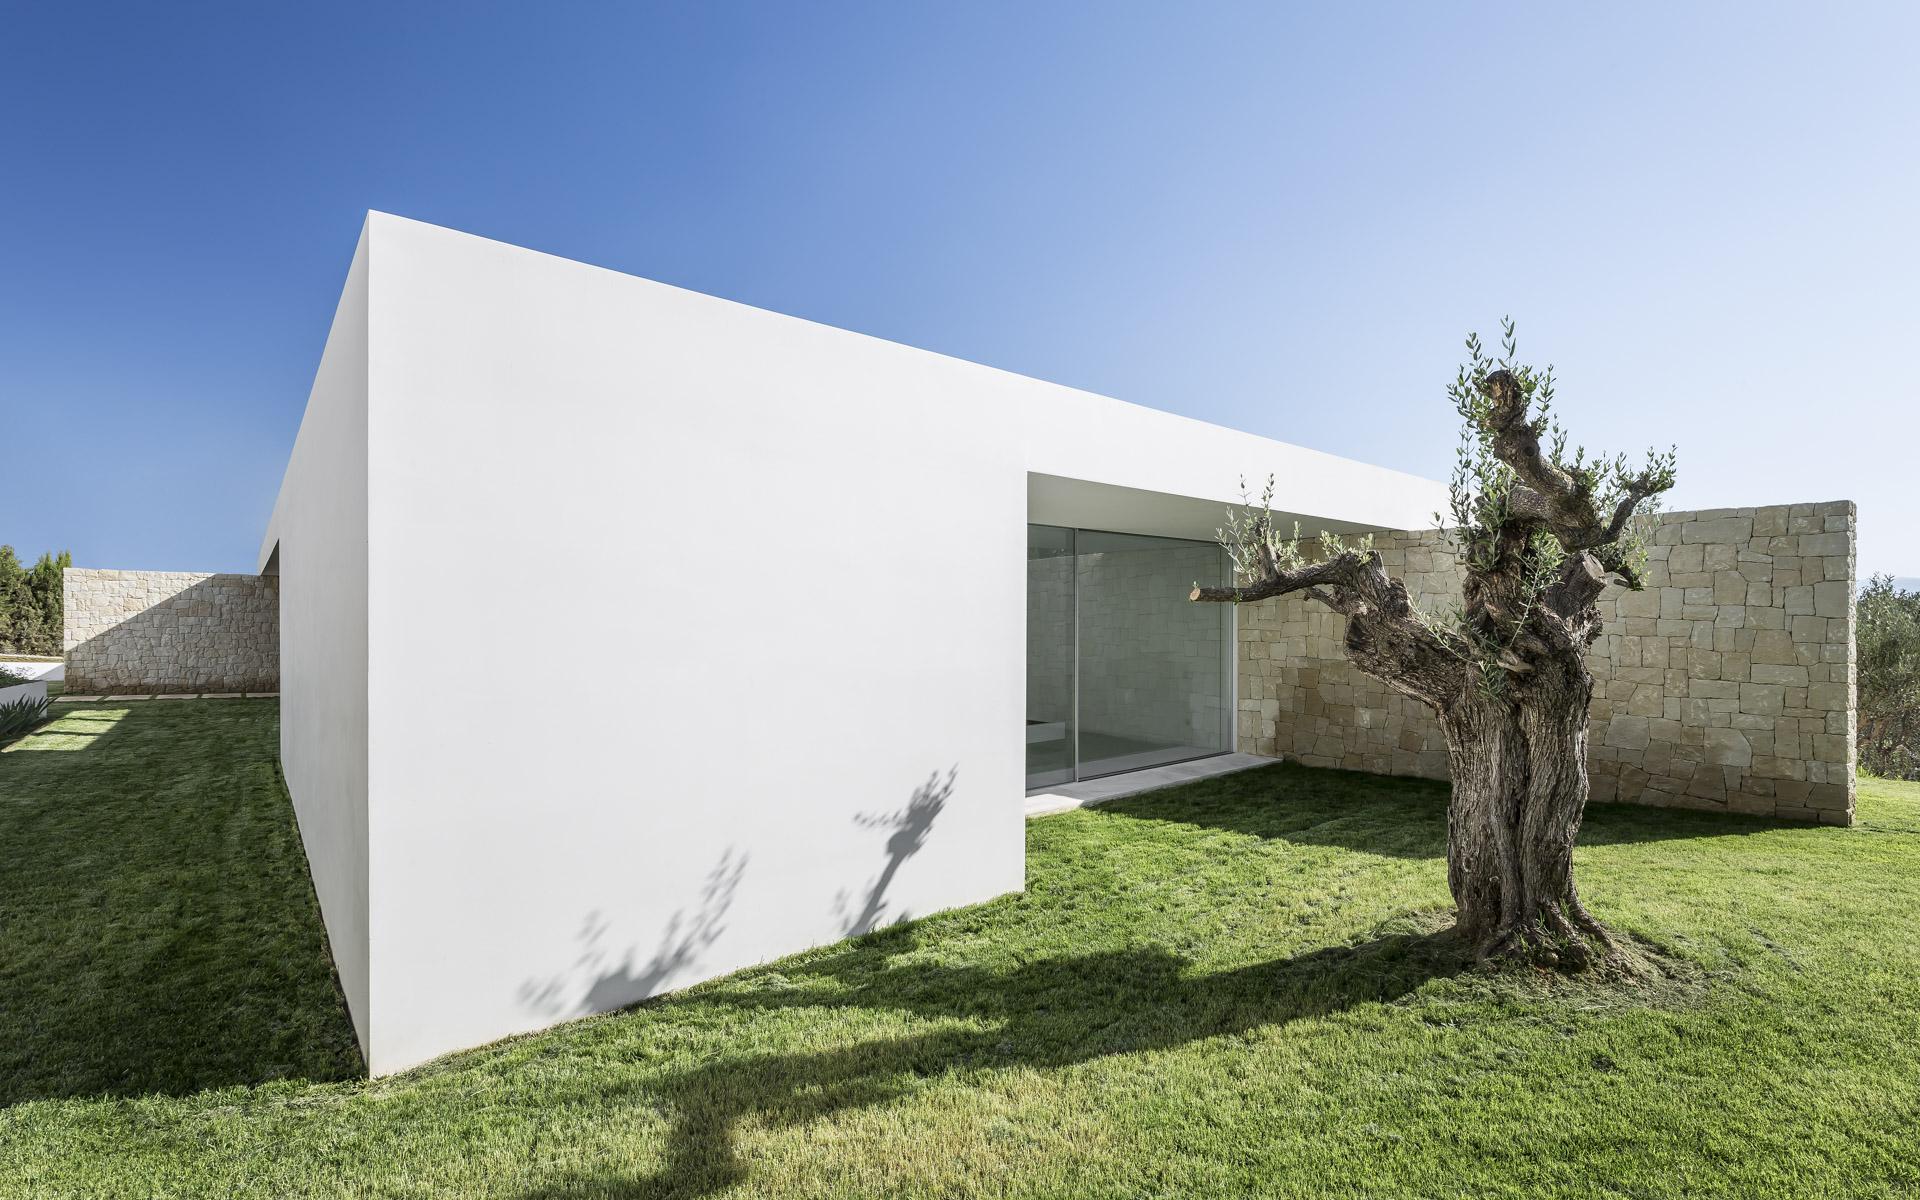 fotografia-arquitectura-valencia-german-cabo-gallardo-llopis-villamarchante-vivienda-11